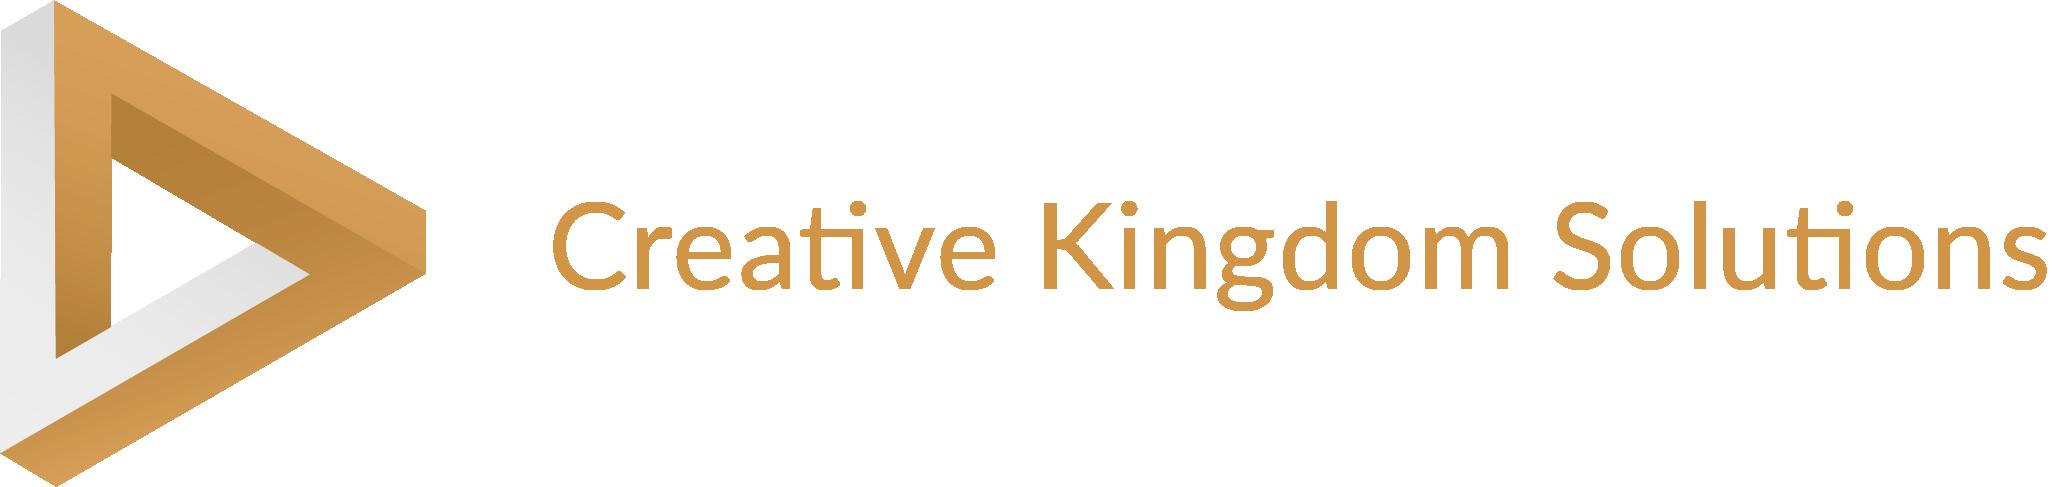 Creative Kingdom Solutions